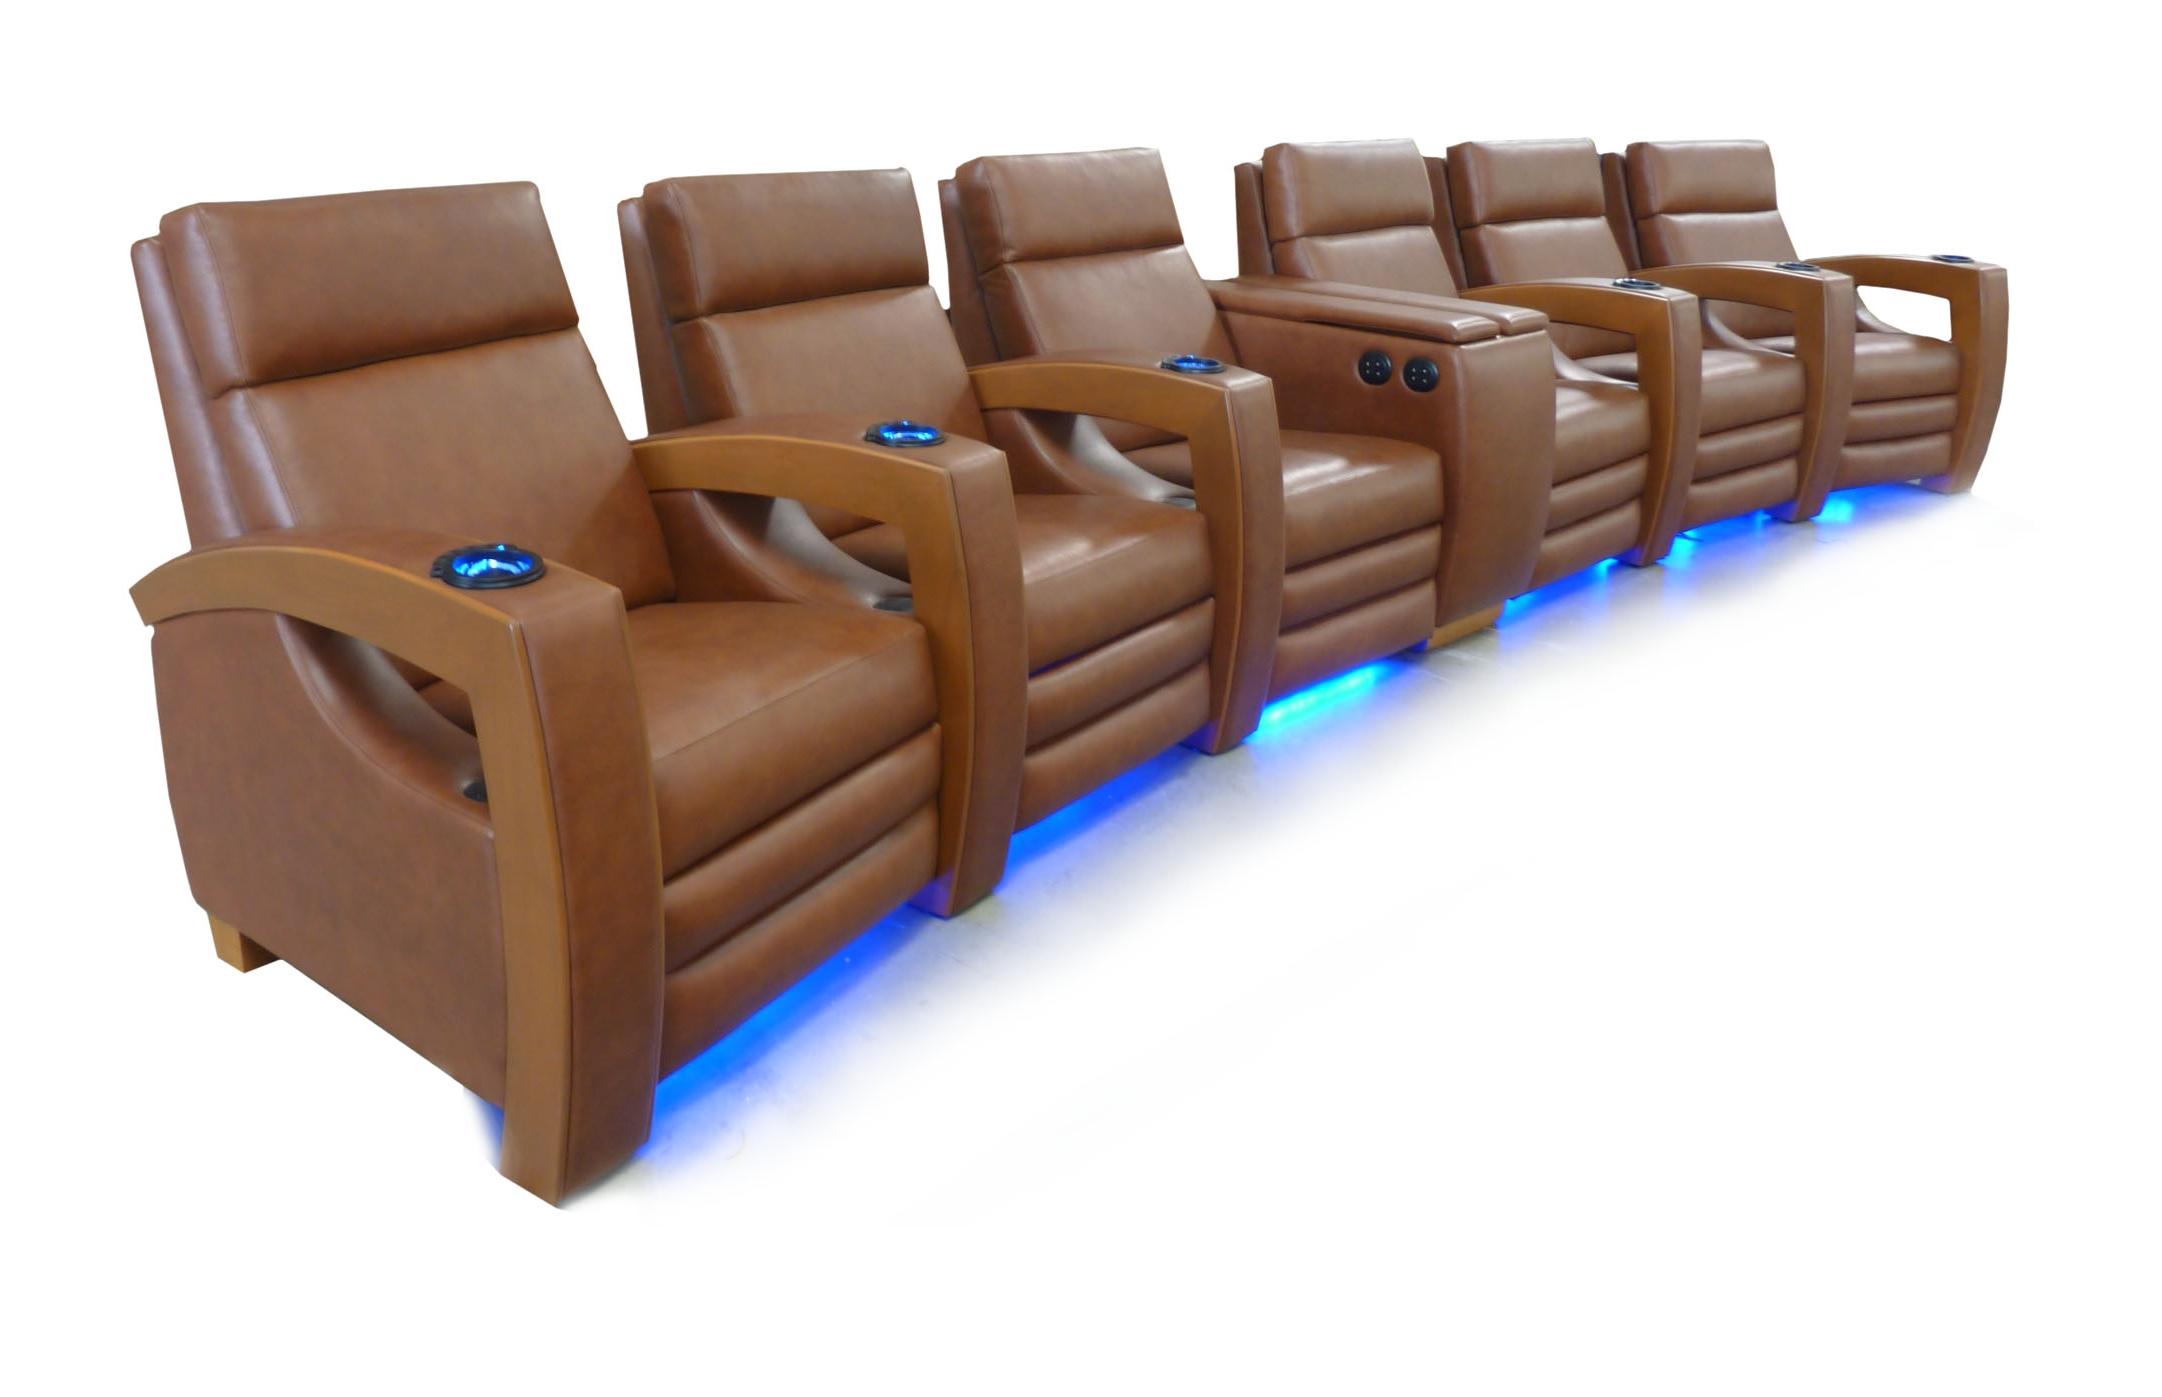 LED Floor Lighting; LED Cup Holders; Model: Uptown